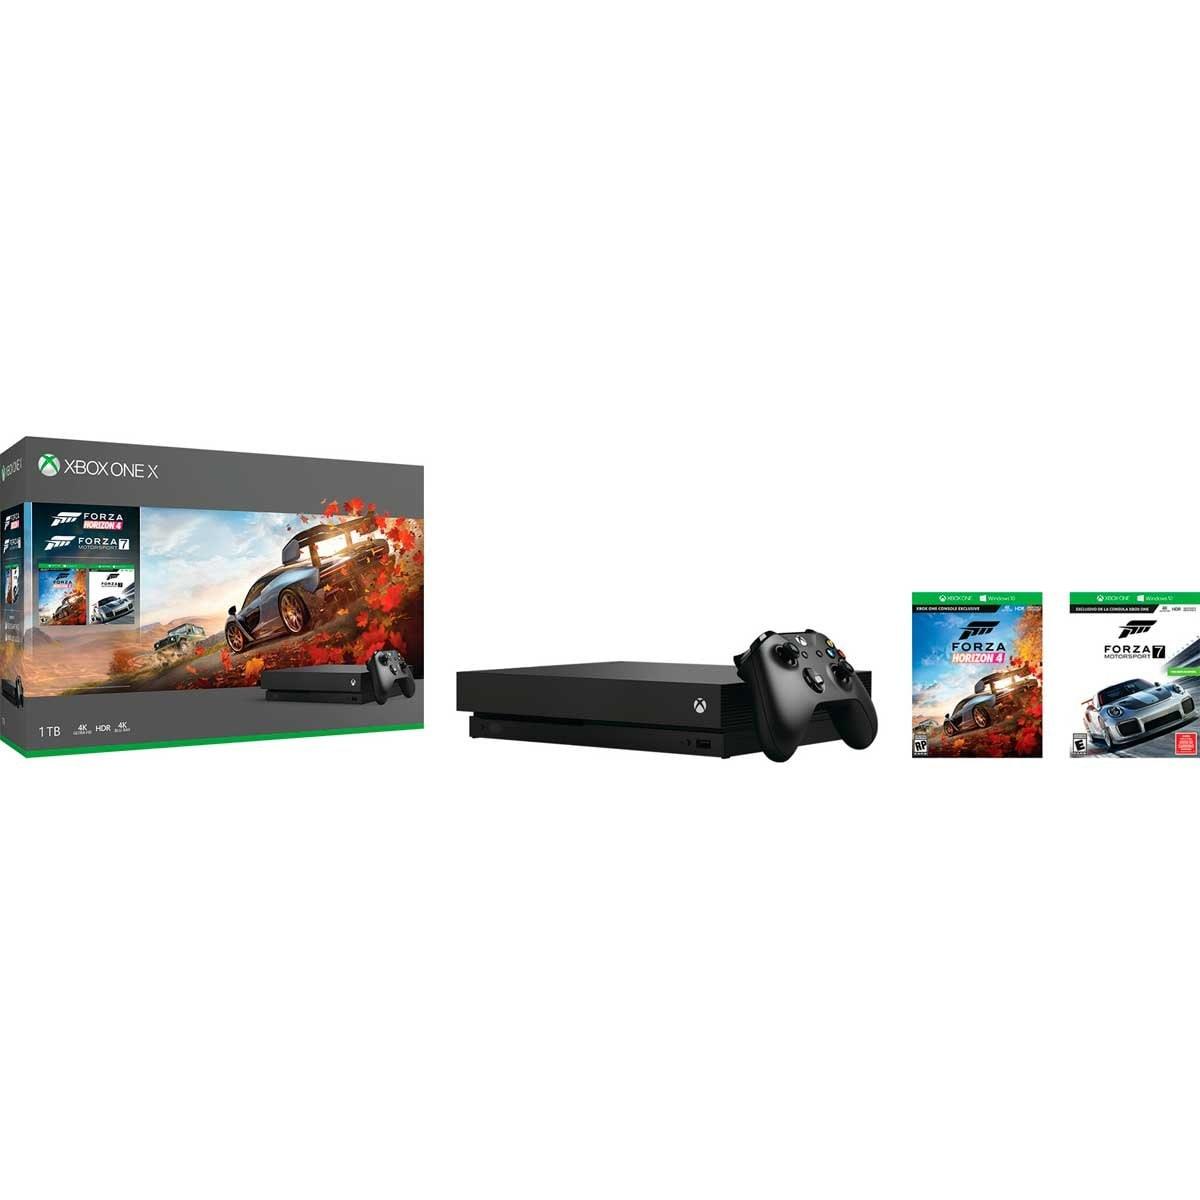 Consola Xbox One X 1Tb Forza Horizon 4 Y Lego Dlc